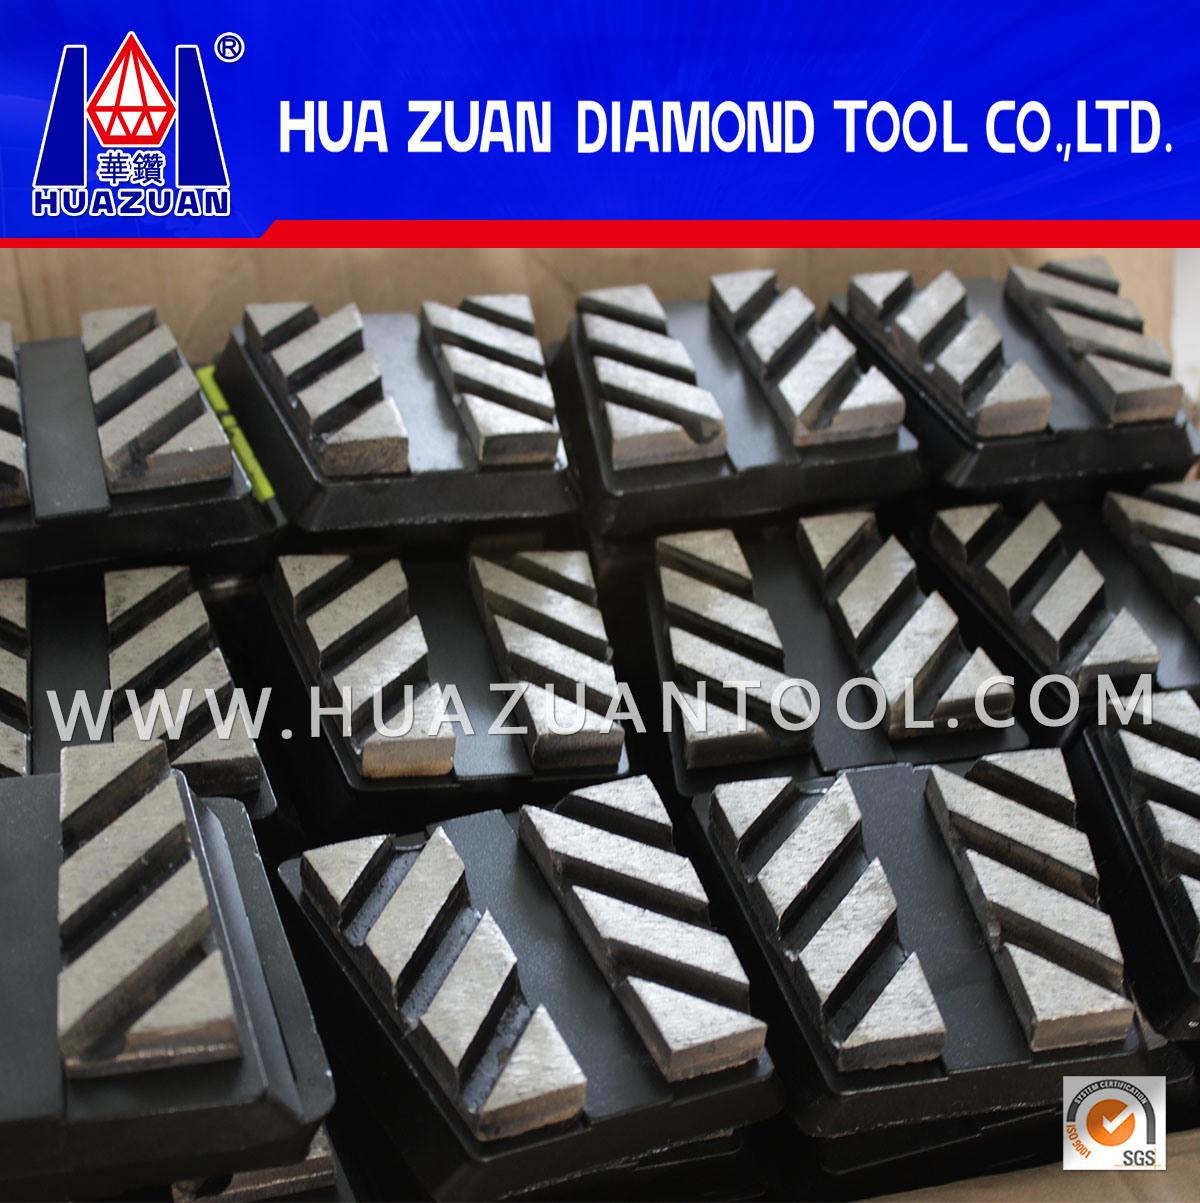 Various Diamond Tool for Cutting Grinding Polishing Drilling